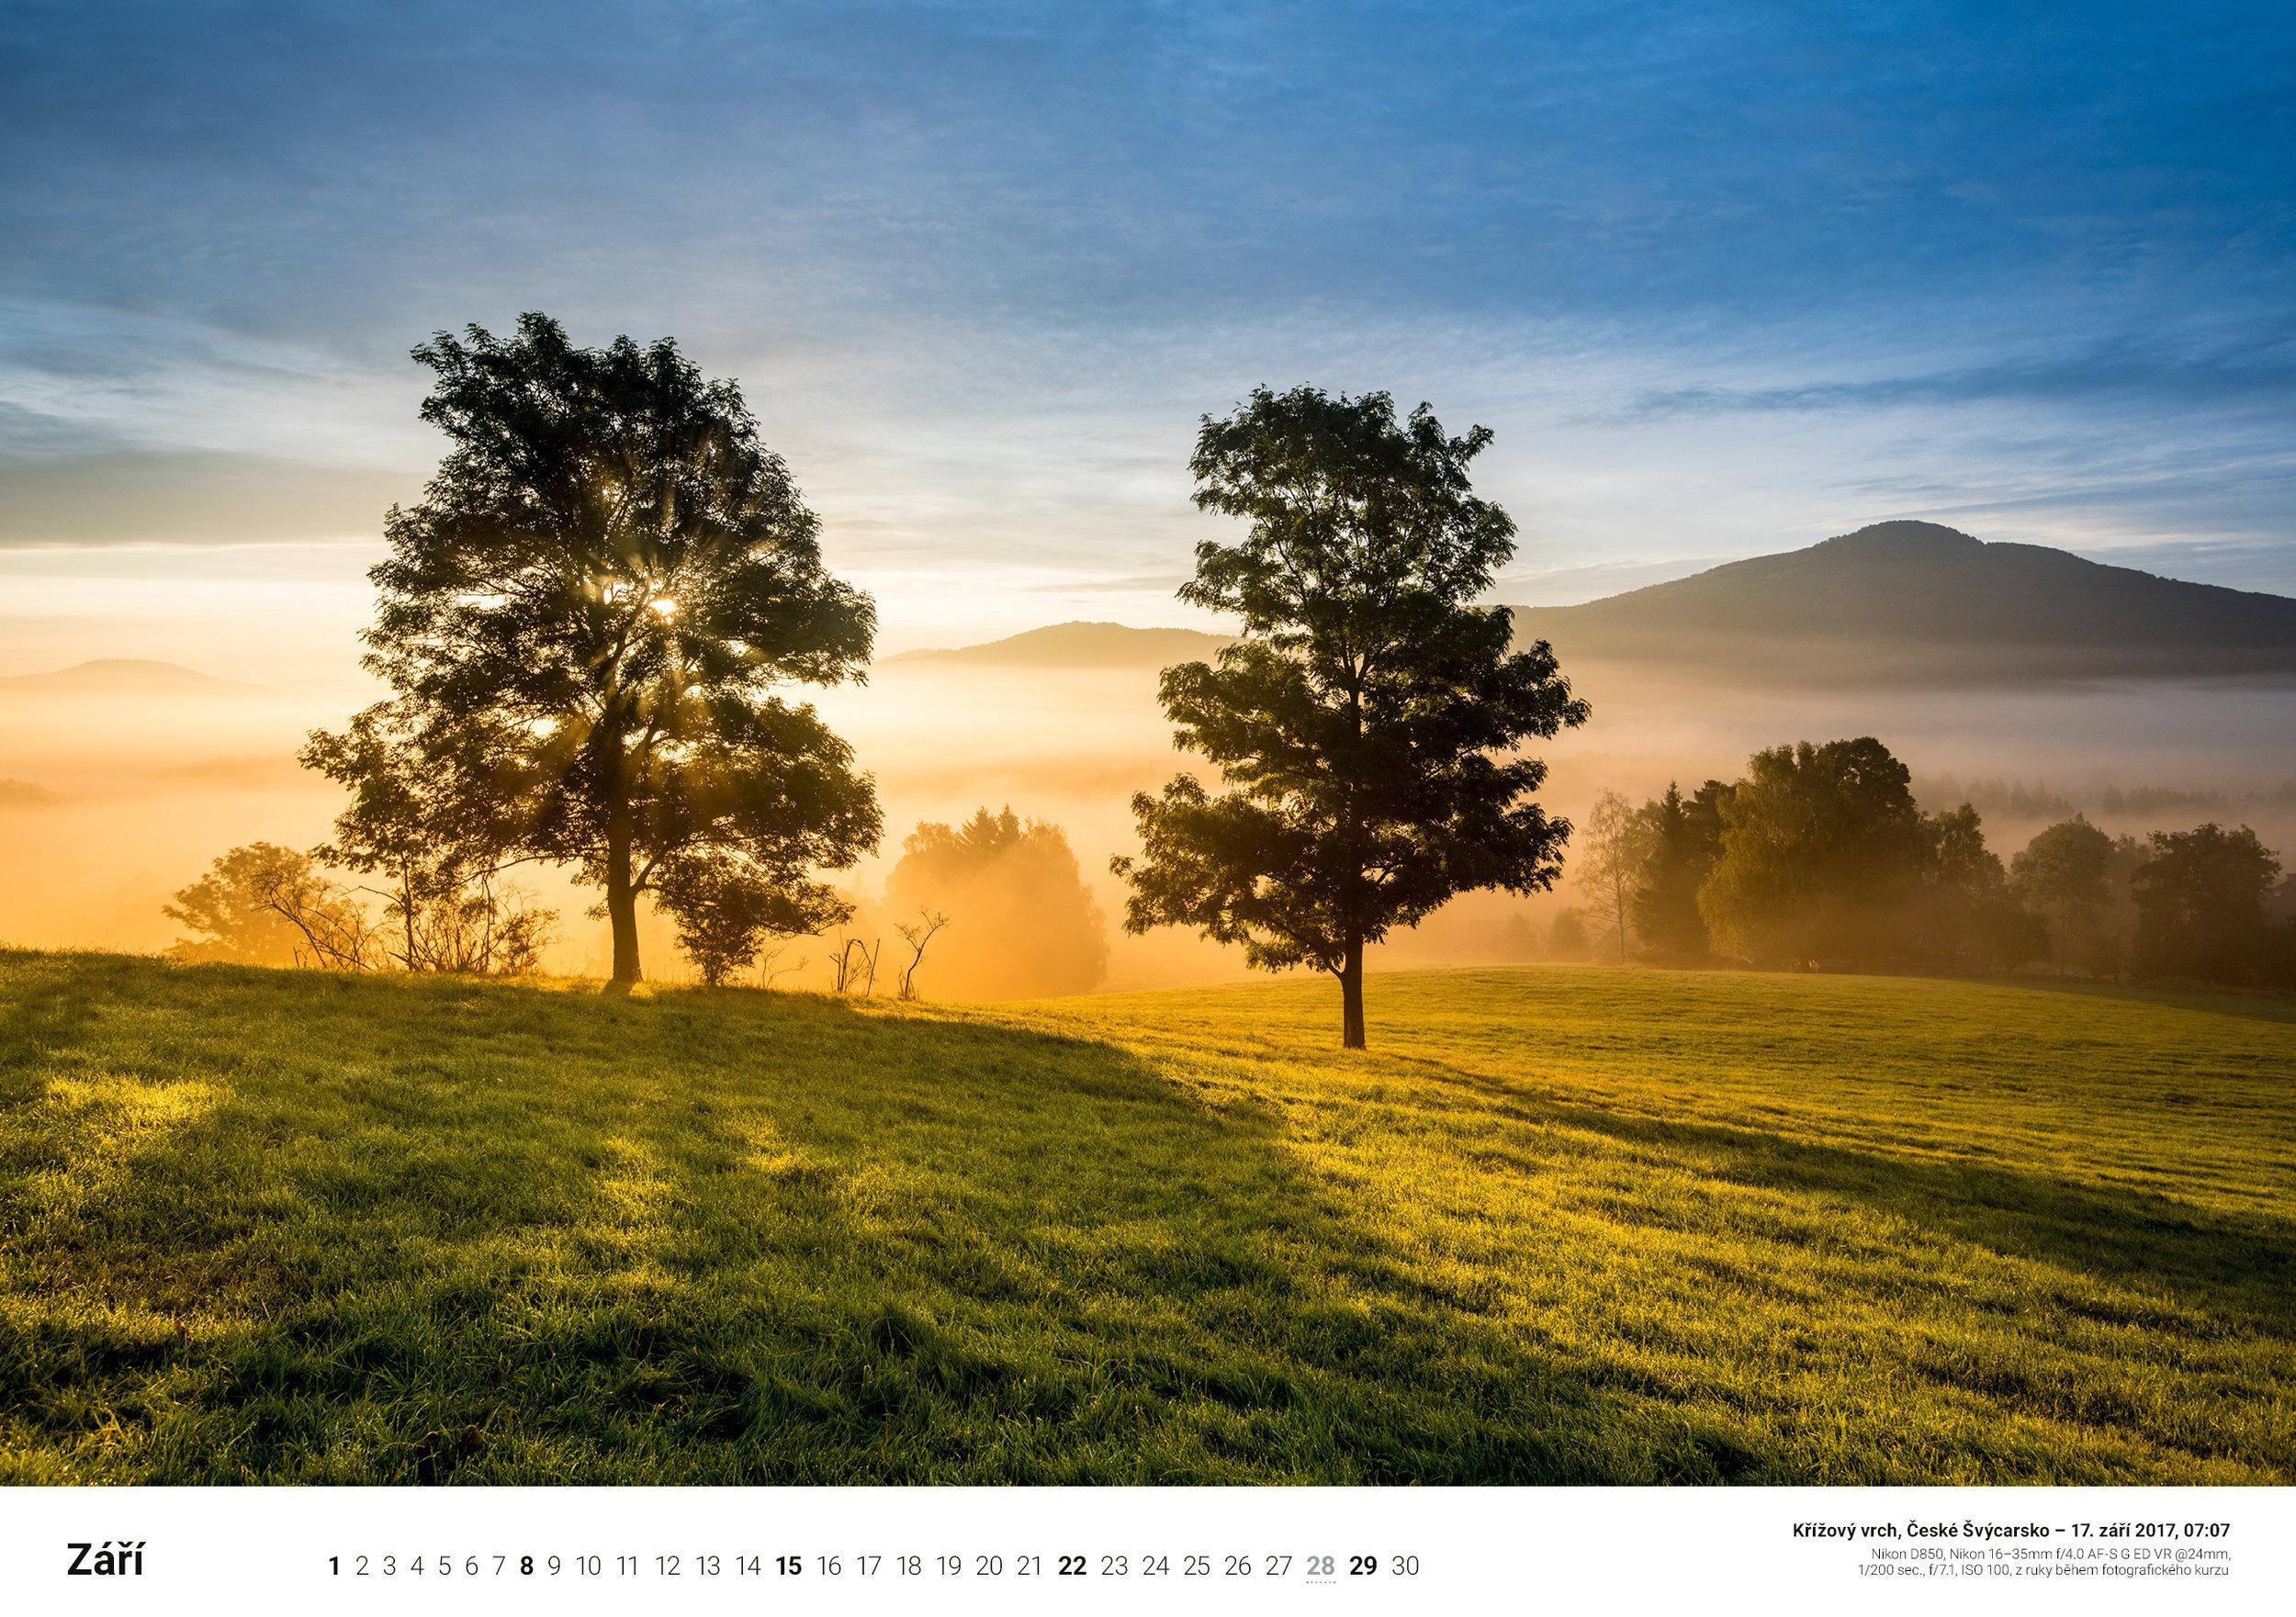 juracka_kalendar-2019_440x310mm_01.jpg